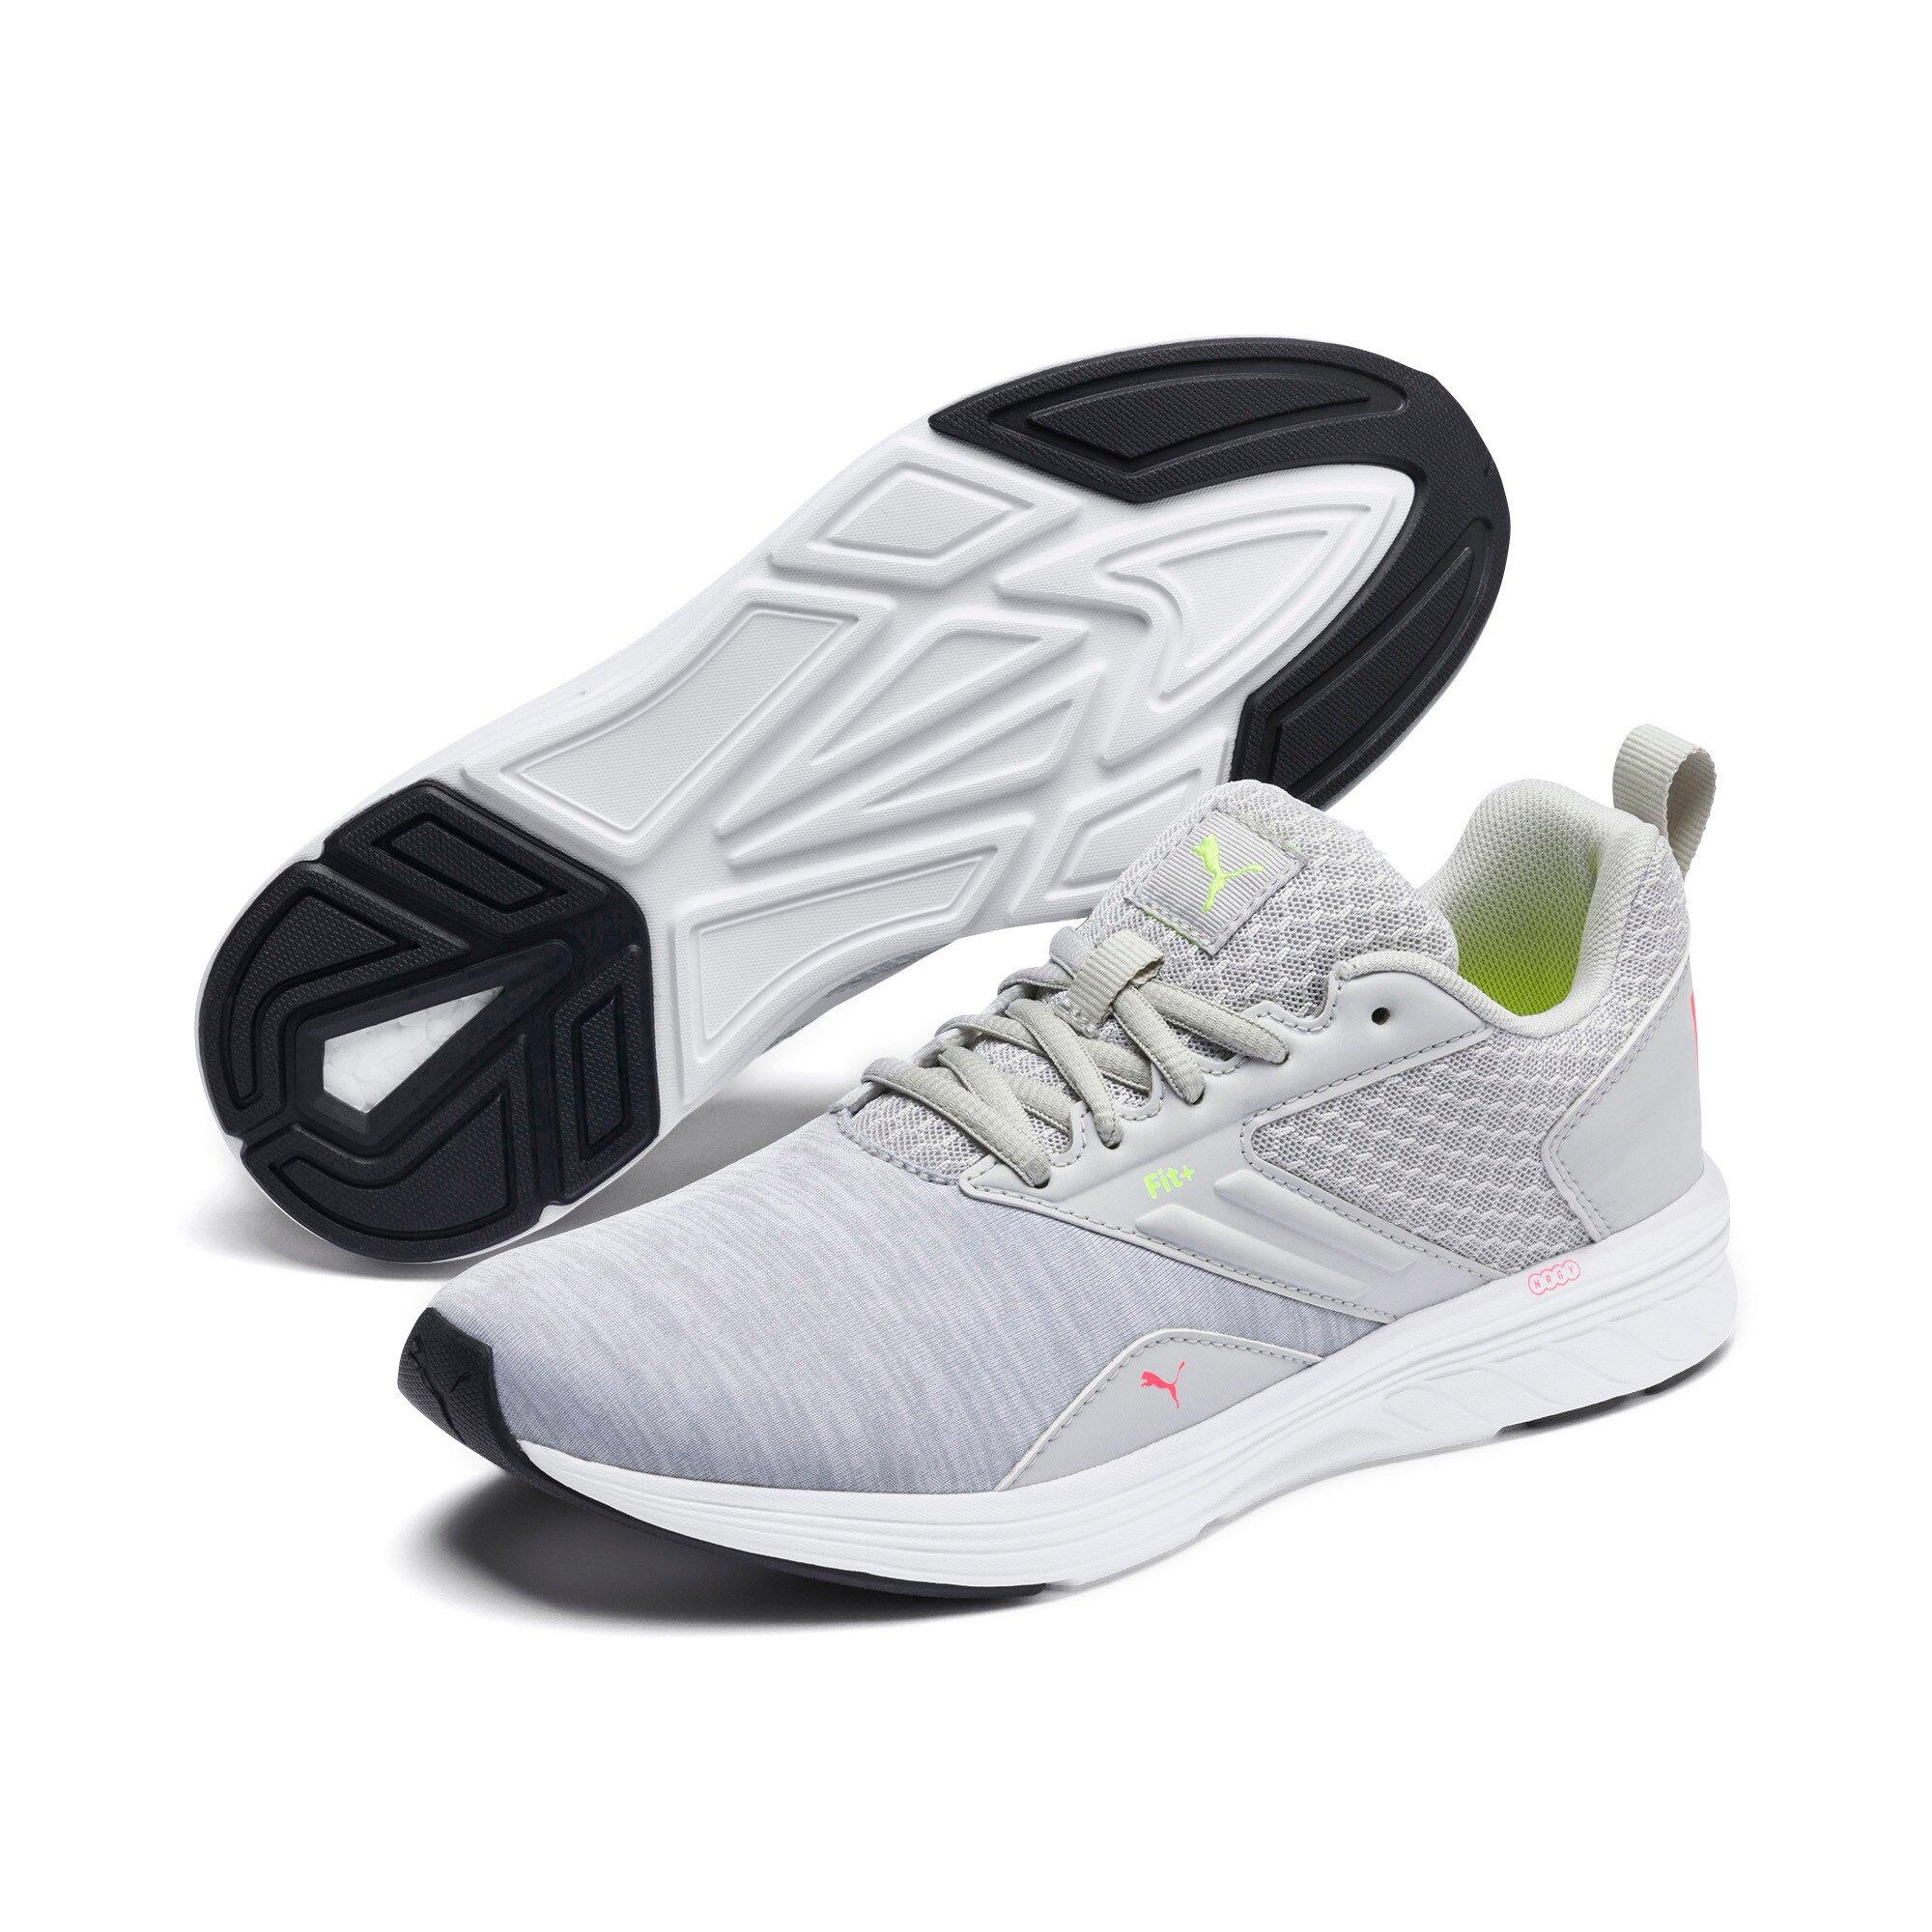 Puma Men's Comet Running Shoes $21 & More + Free S/H